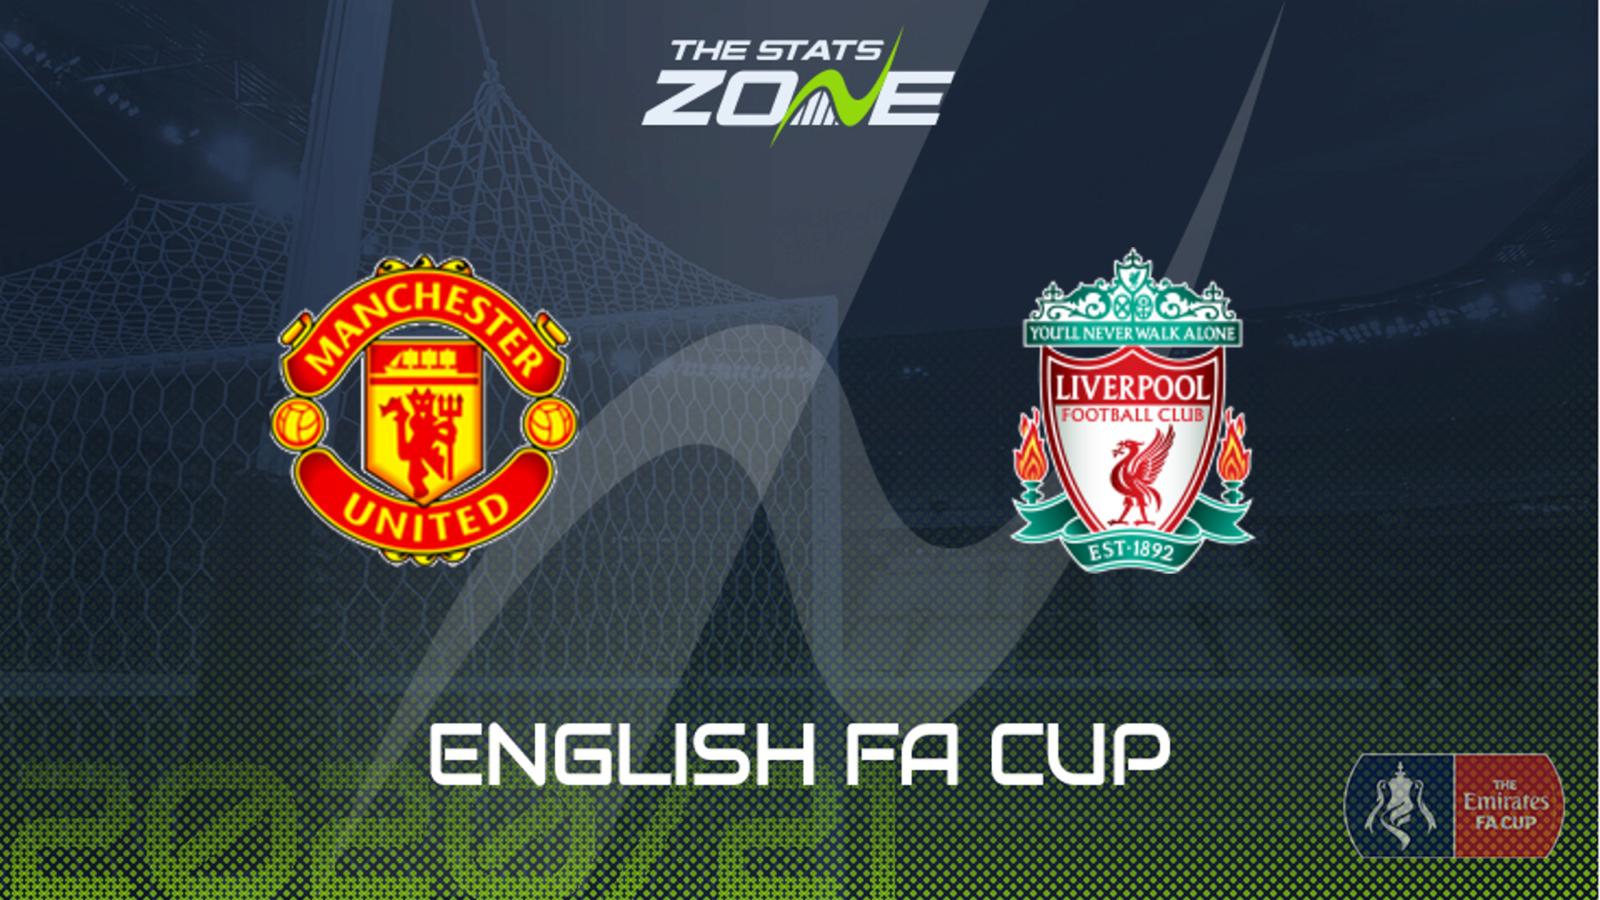 2020 21 Fa Cup Man Utd Vs Liverpool Preview Prediction The Stats Zone